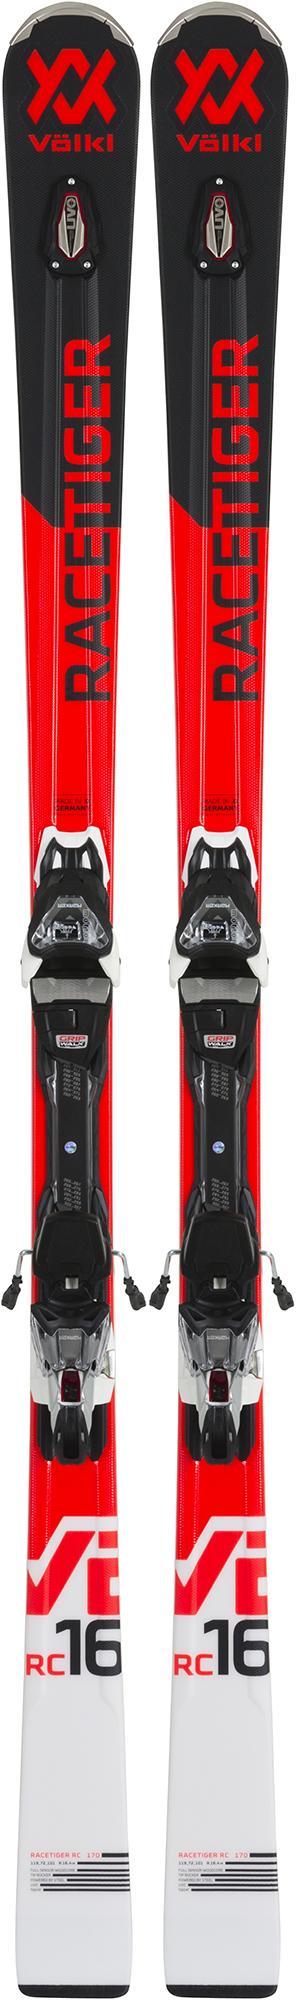 Volkl Volkl Racetiger RC black + VMotion 11 GW (18/19), размер 170 лыжи крепления volkl volkl flair 73 vmotion 9 gw lady 17 18 размер 153